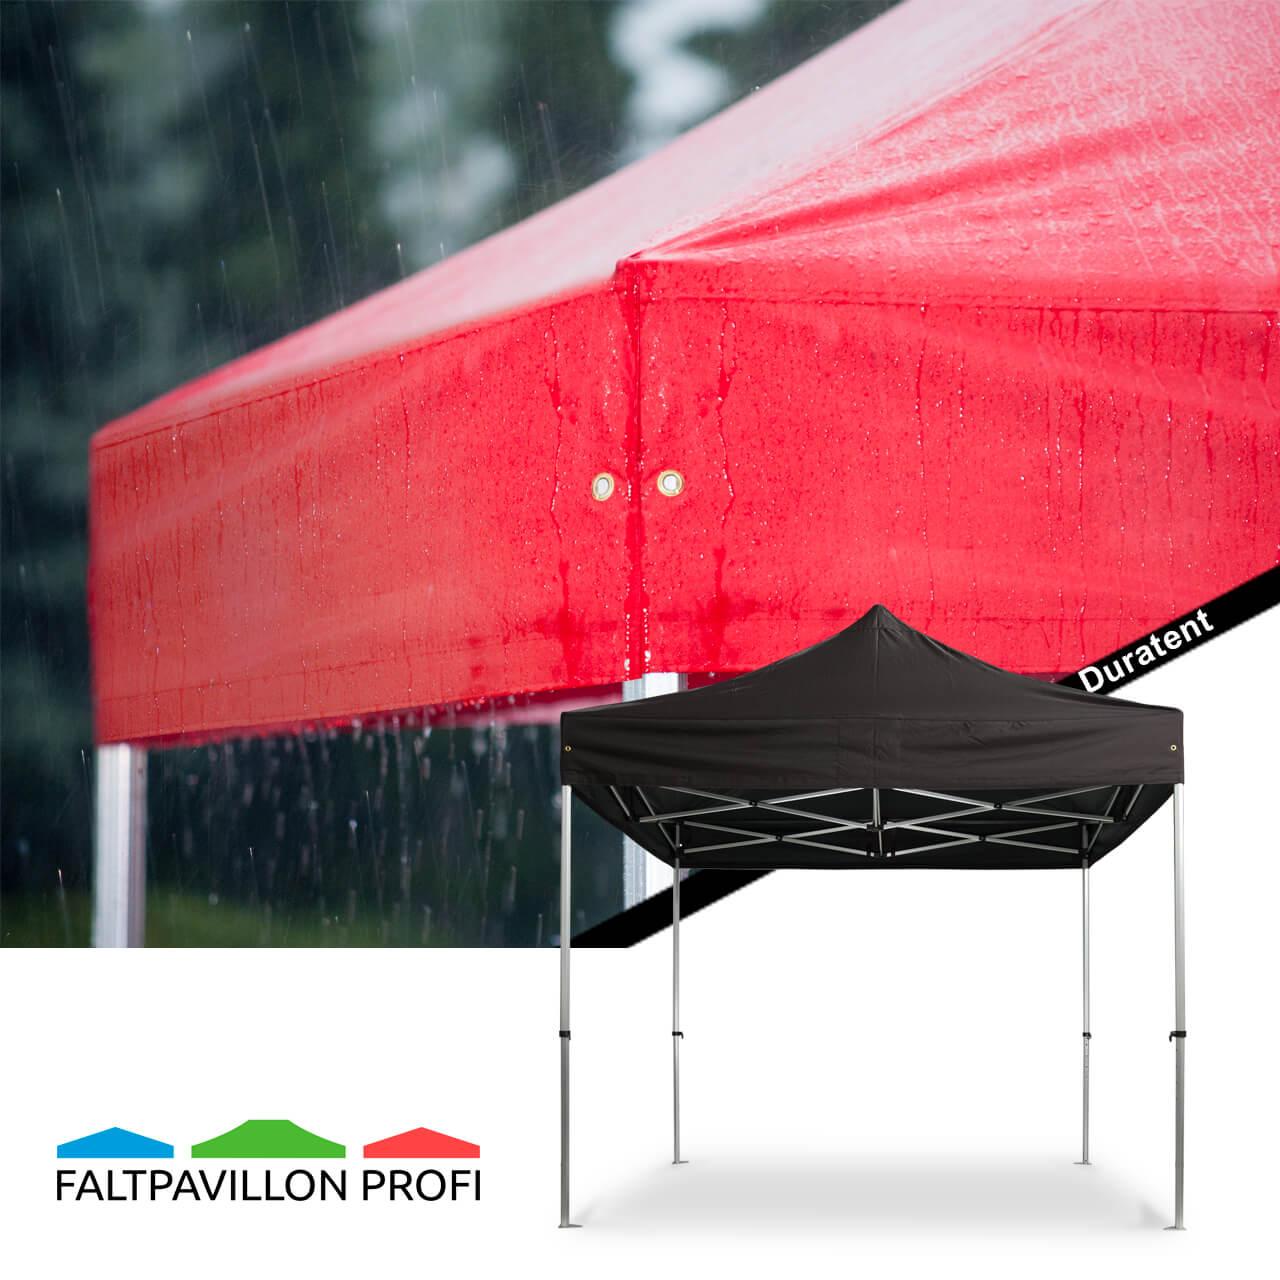 Faltpavillon-wasserdicht-schwarz-3x3-stabil